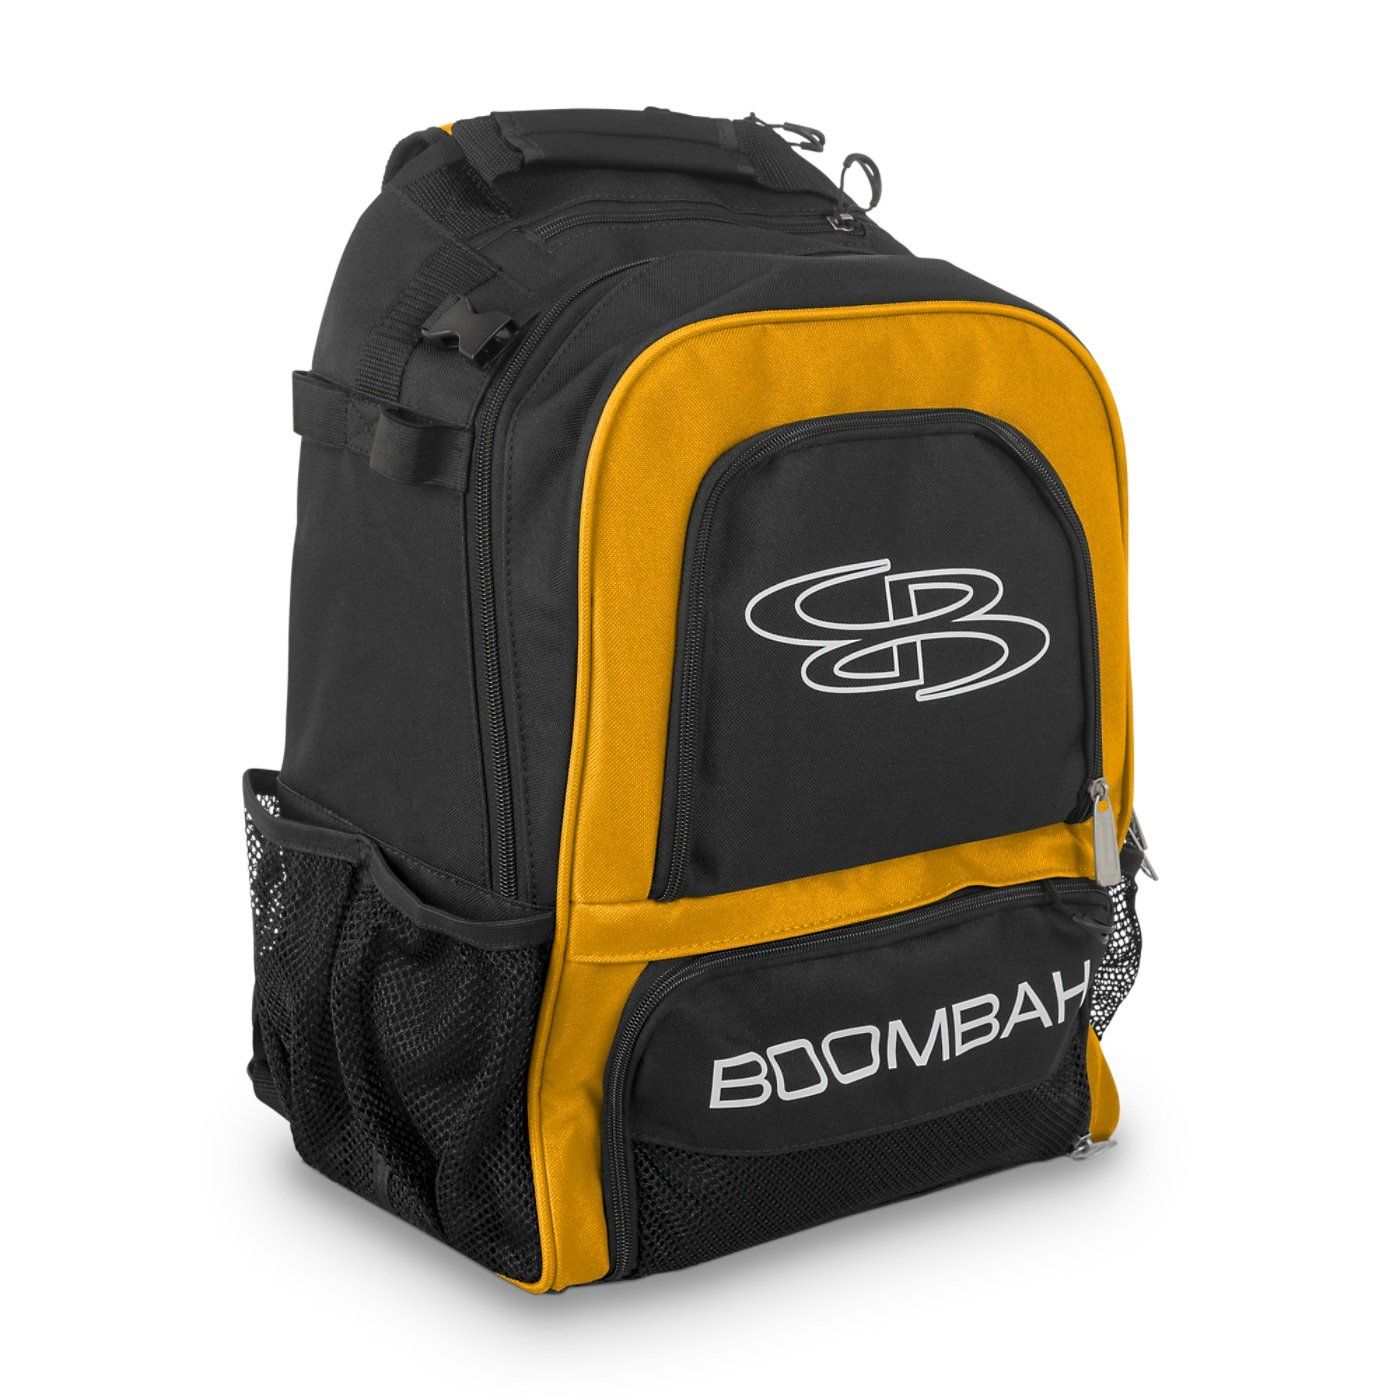 Boombah Wonderpack Baseball / Softball Batバックパック – 13